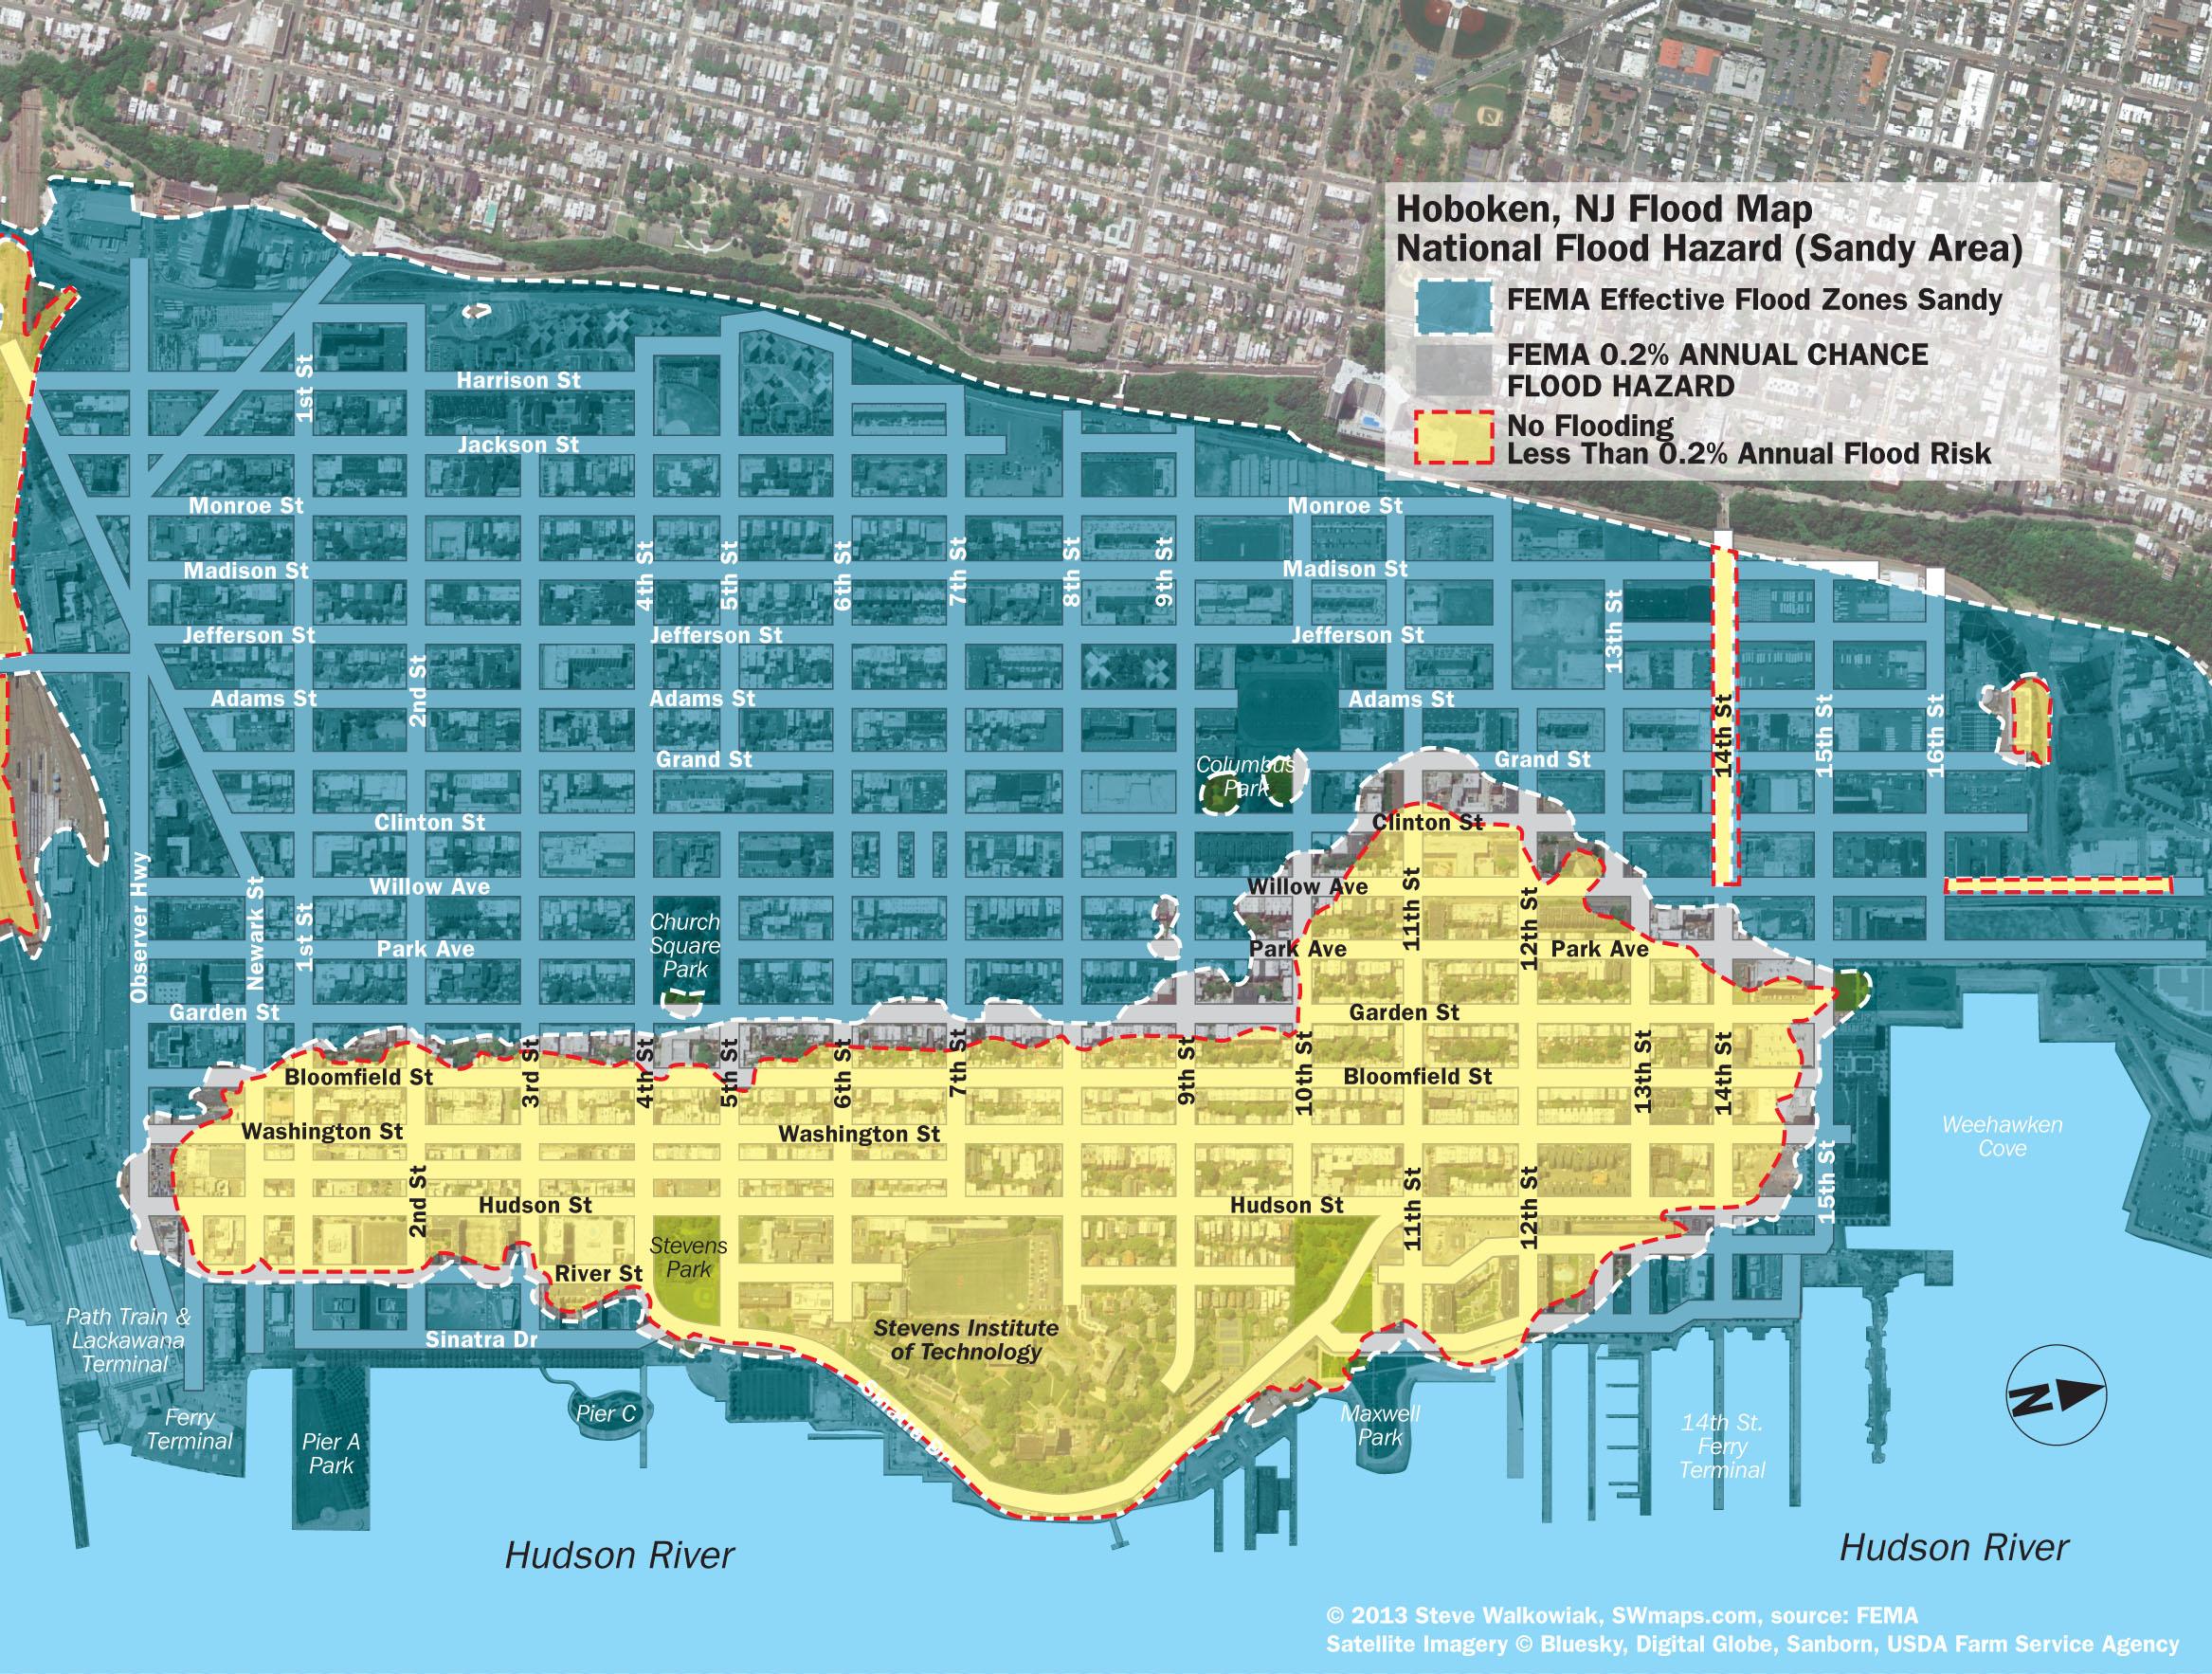 New Hoboken Flood Map With Water Levels, Post Hurricane Sandy - Fema Flood Zone Map Florida